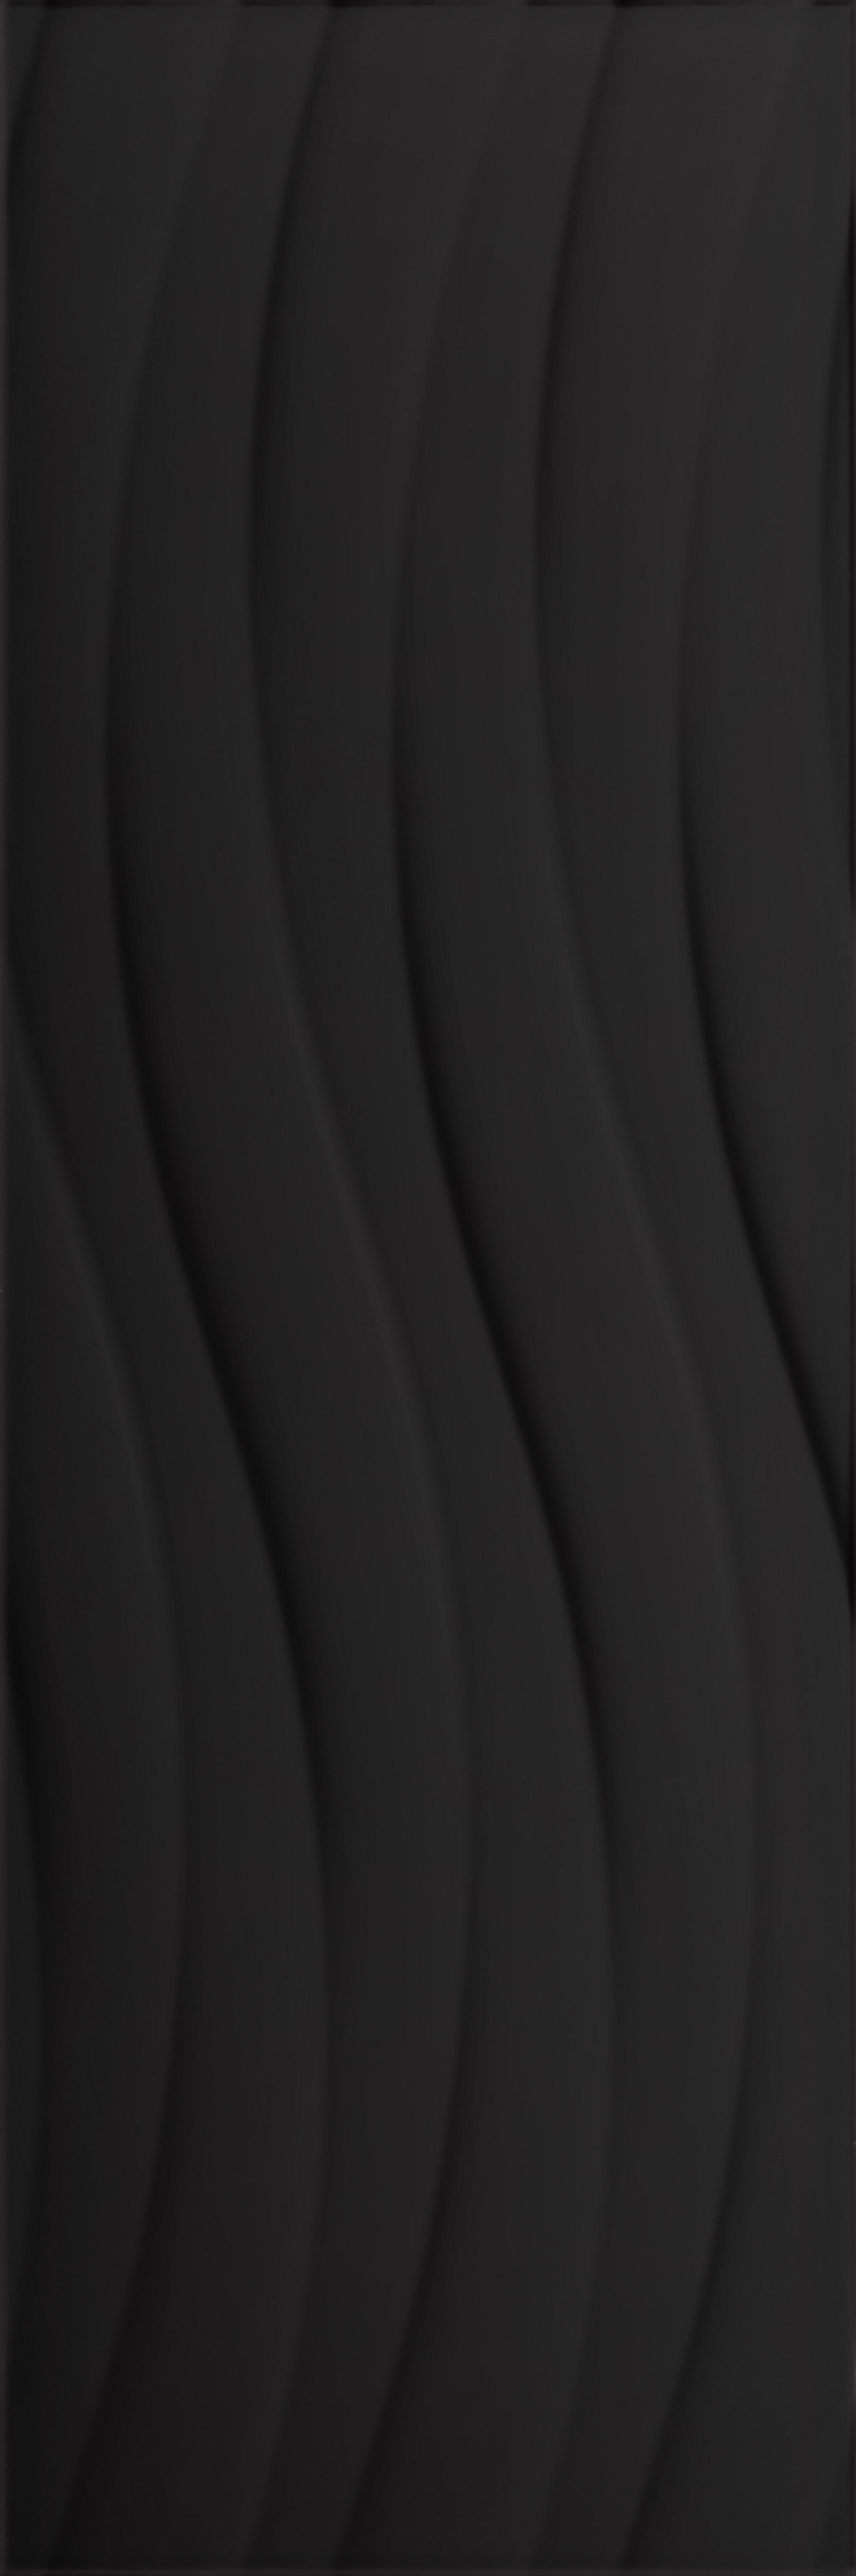 Black Bend / 10x30 Olympus - Centaurus 0